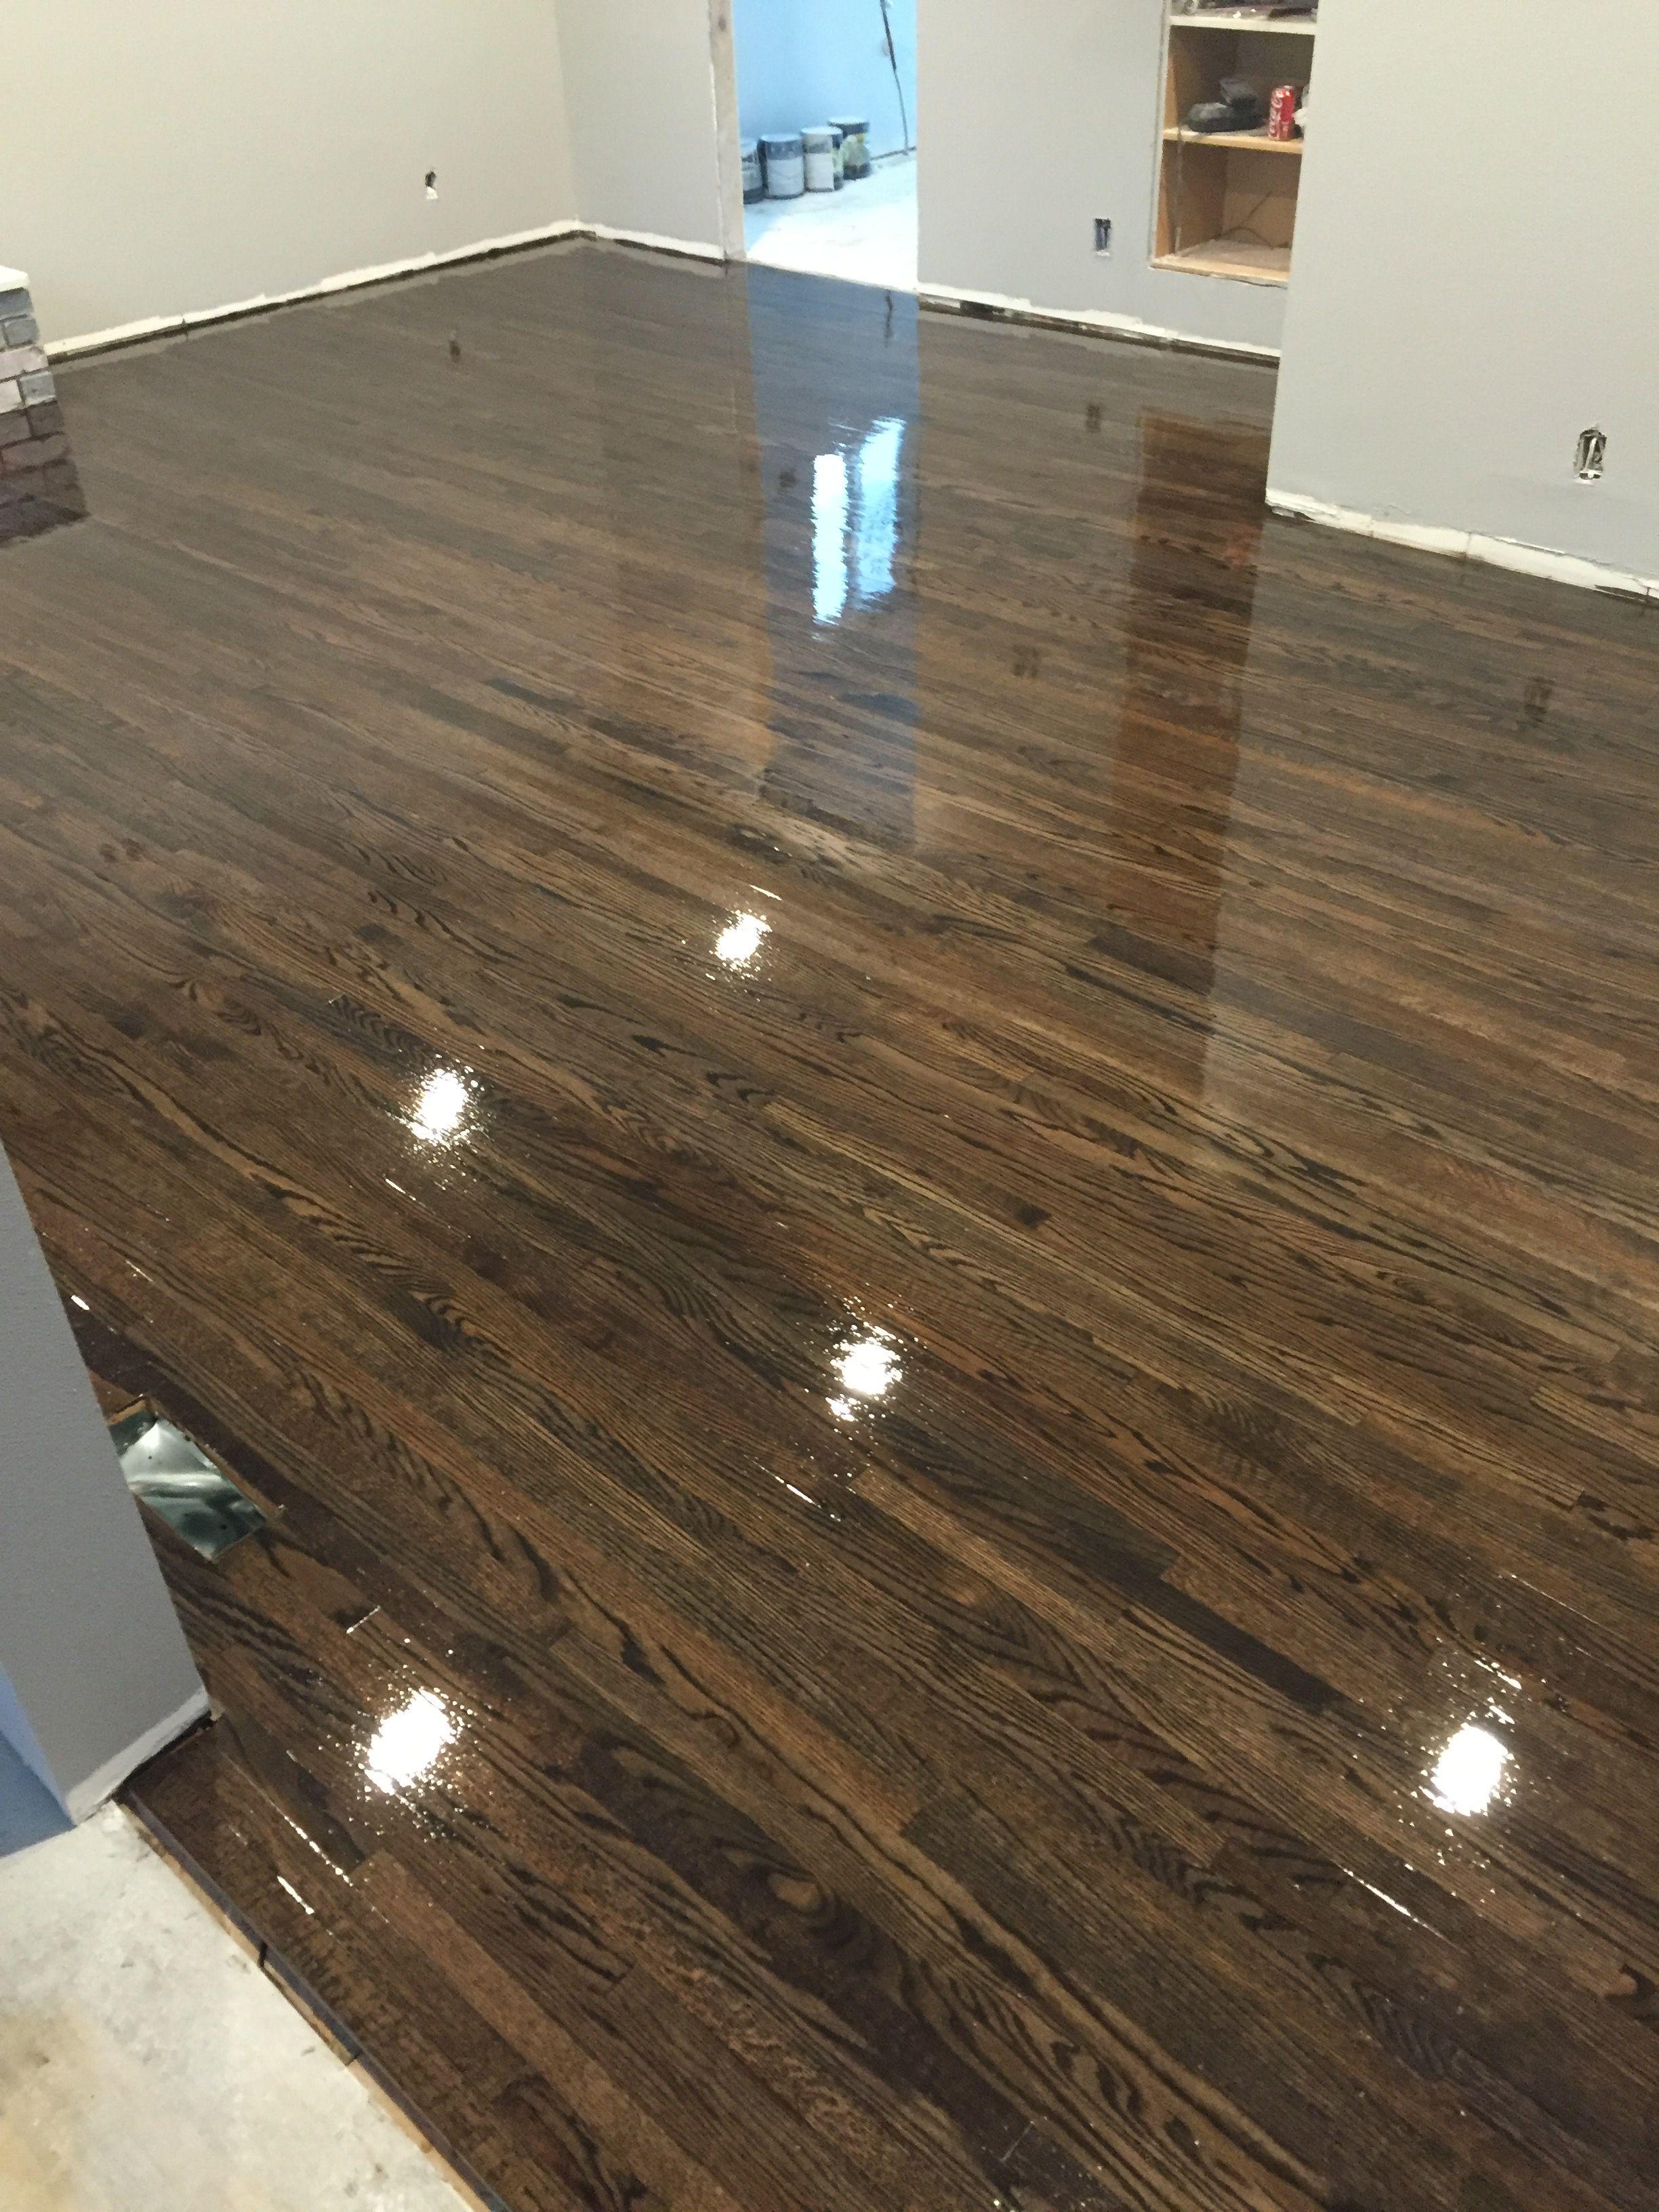 Ebony Red Oak Floor 1 Red oak floors, Oak wood floors